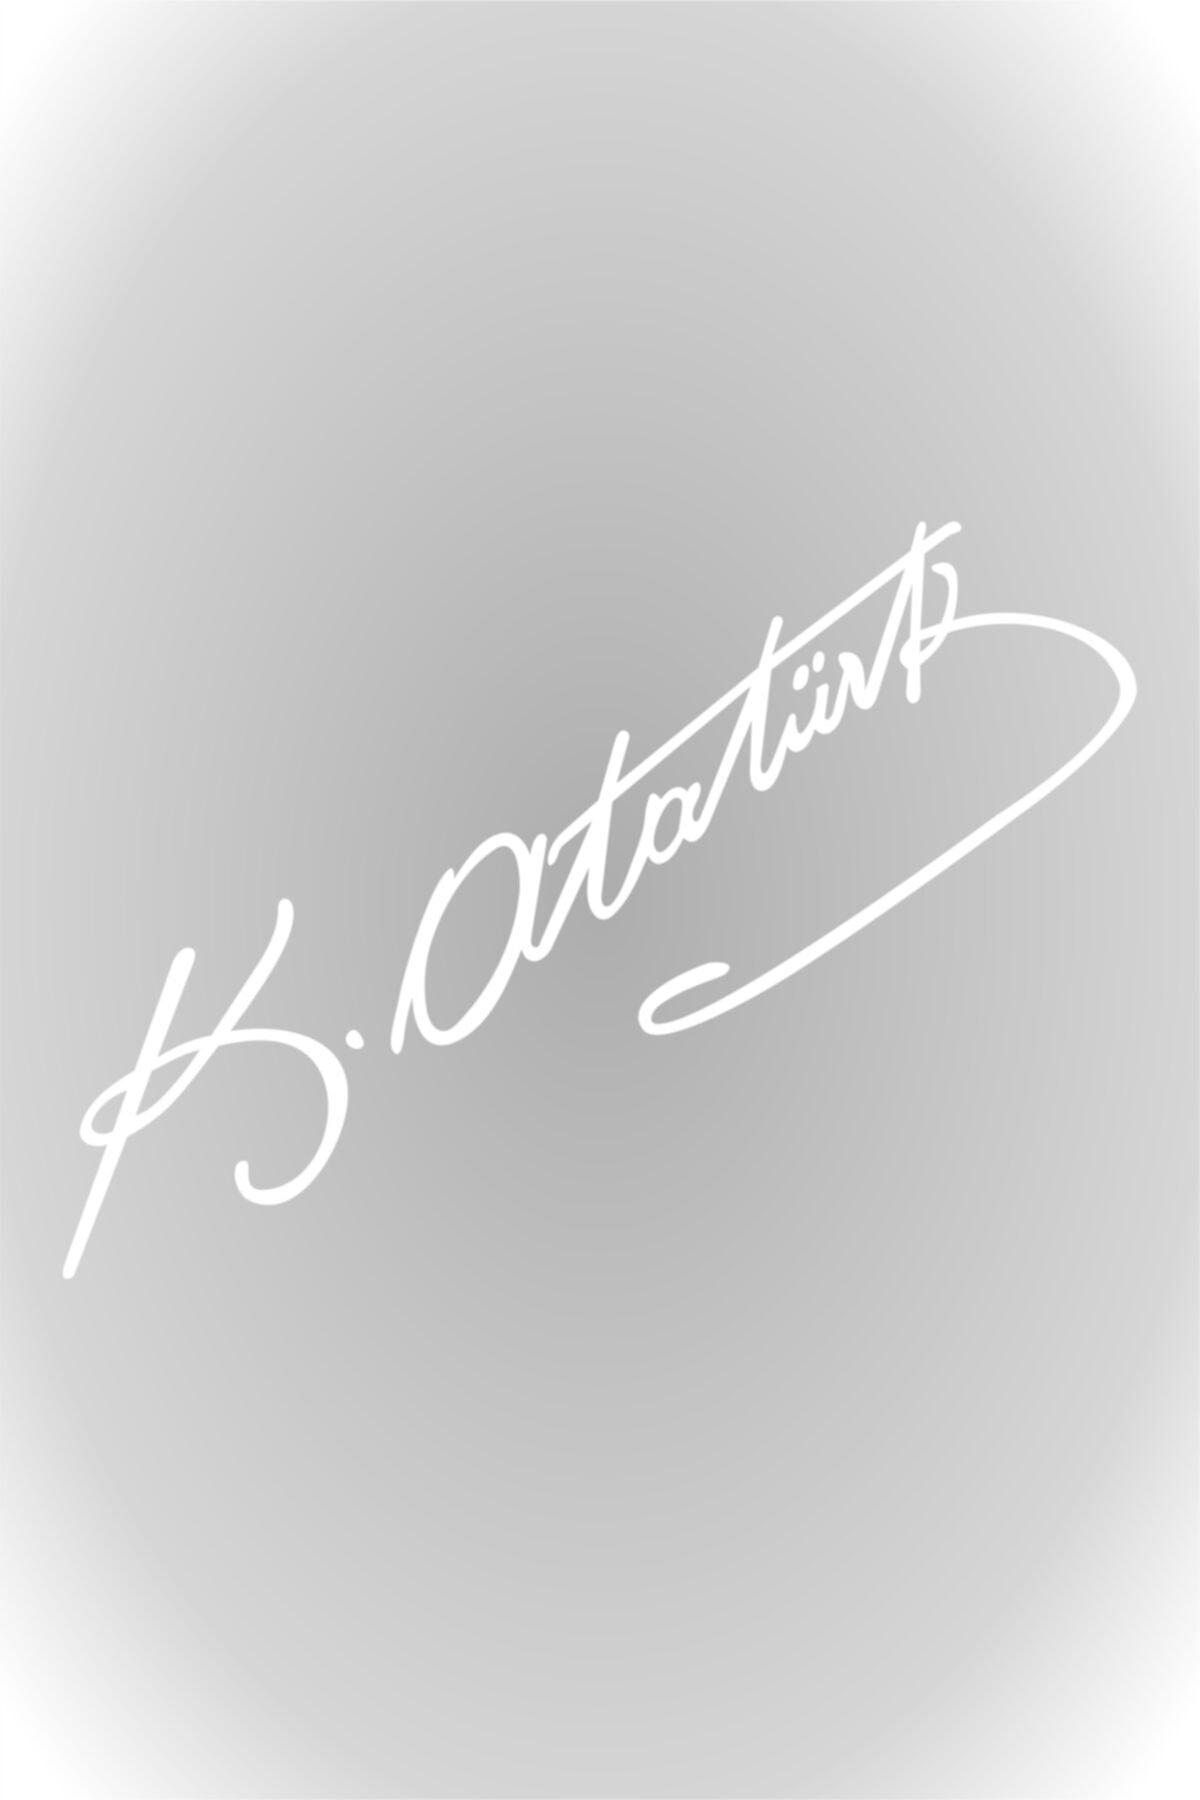 Quart Aksesuar Beyaz 30 Cm Kemal Atatürk Imza Sticker Araba, Oto Araç Sticker 1